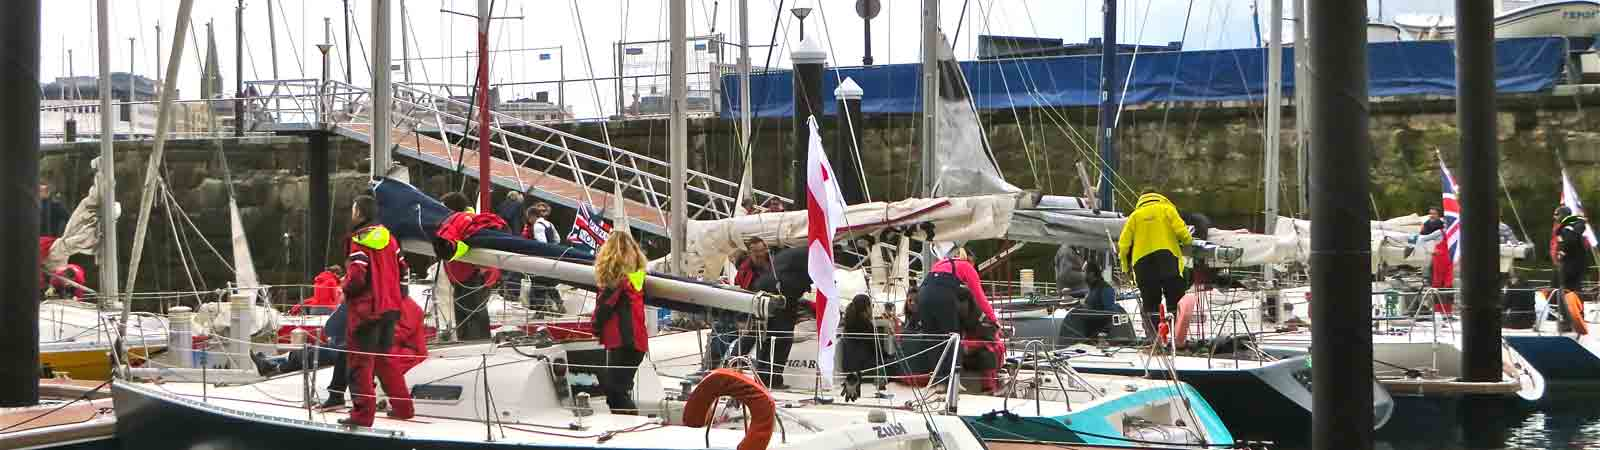 Boat Challenge Donostia San Sebastián 2016